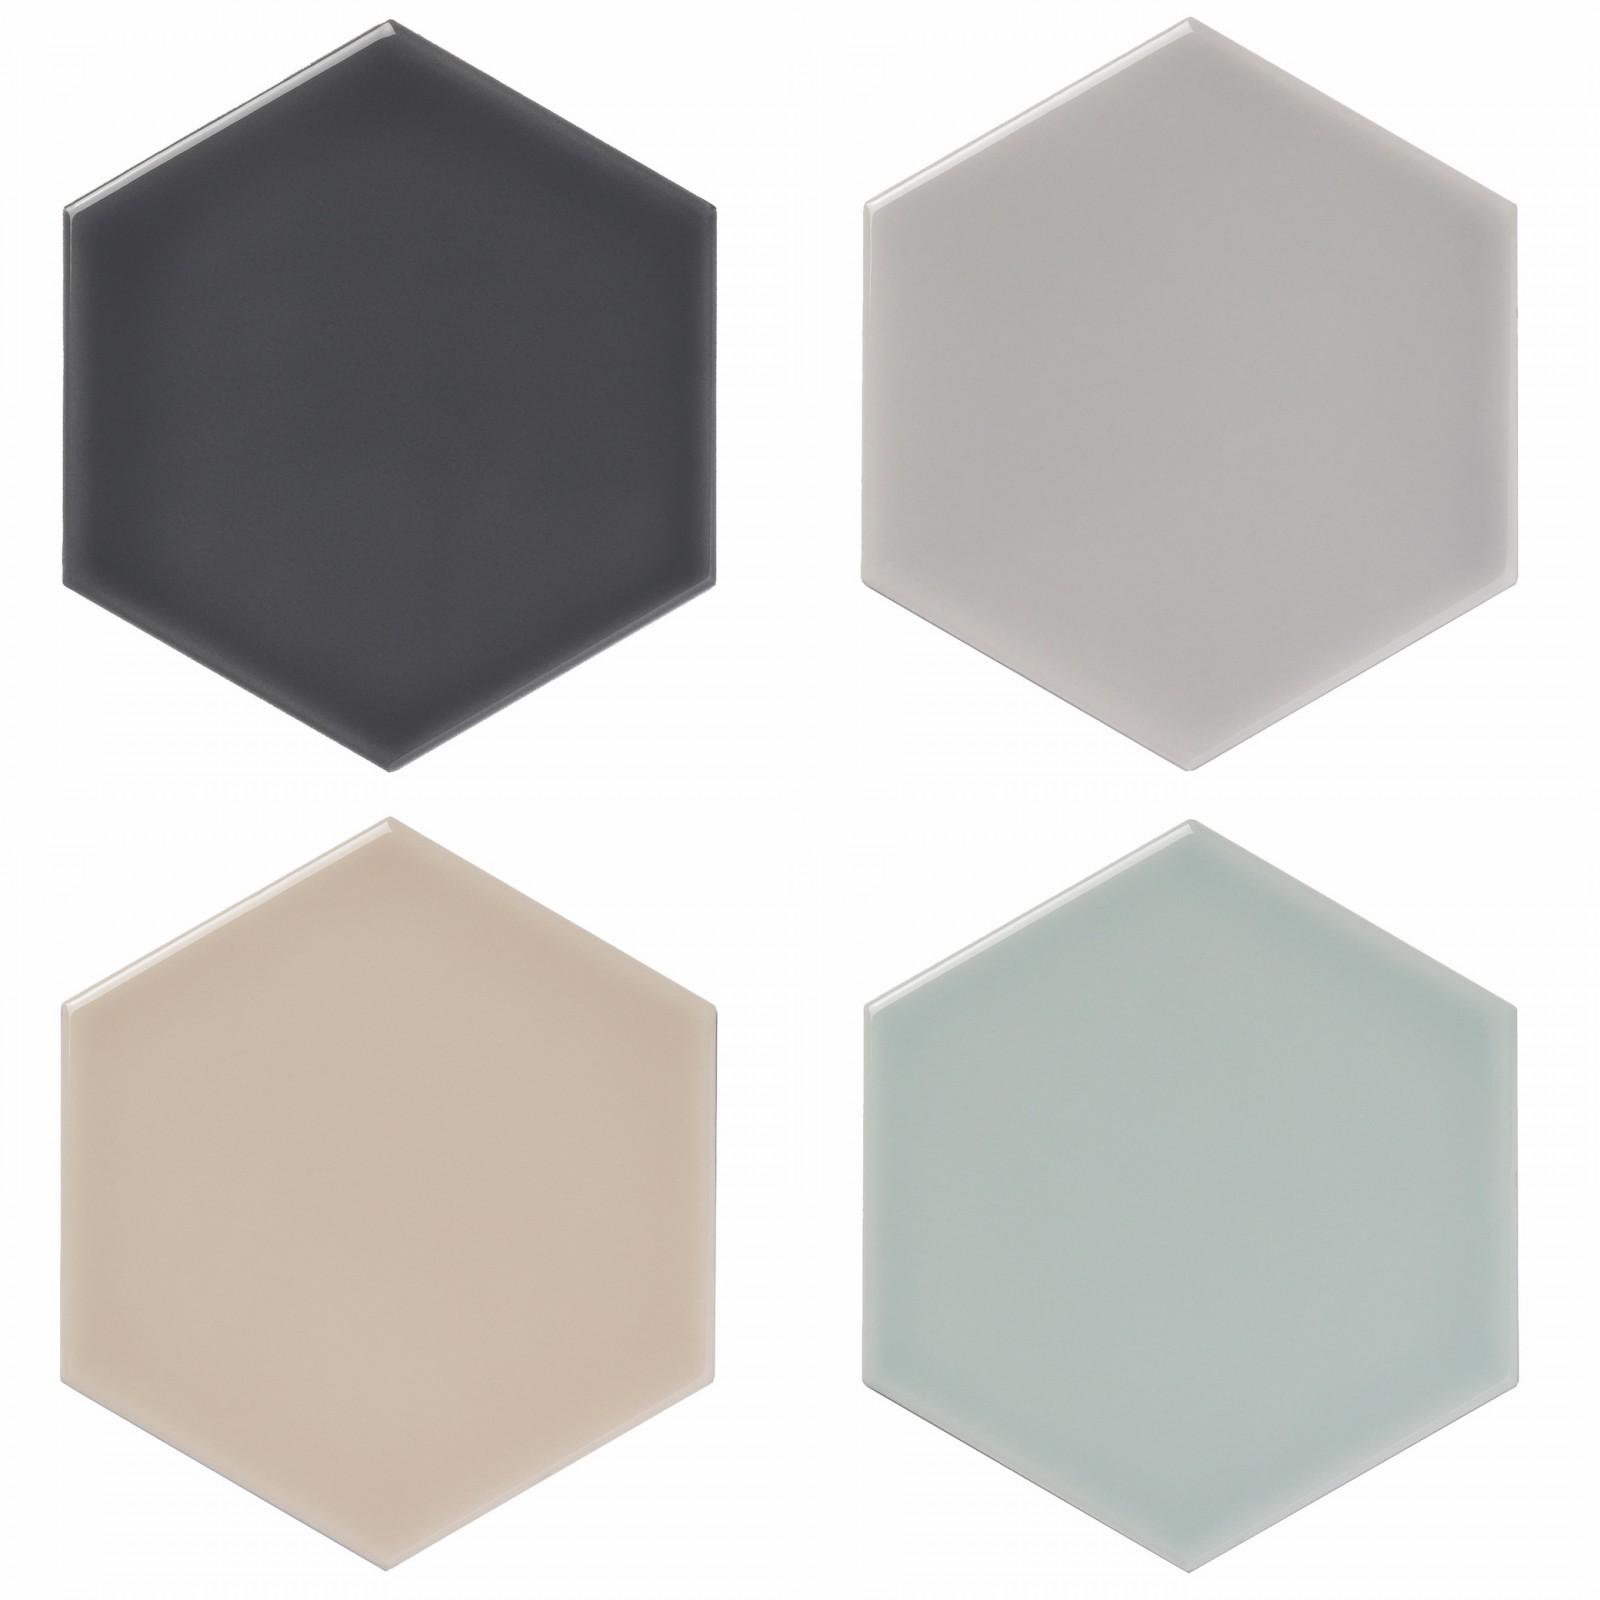 Savoy hexagon tiles by Gemini Tiles.